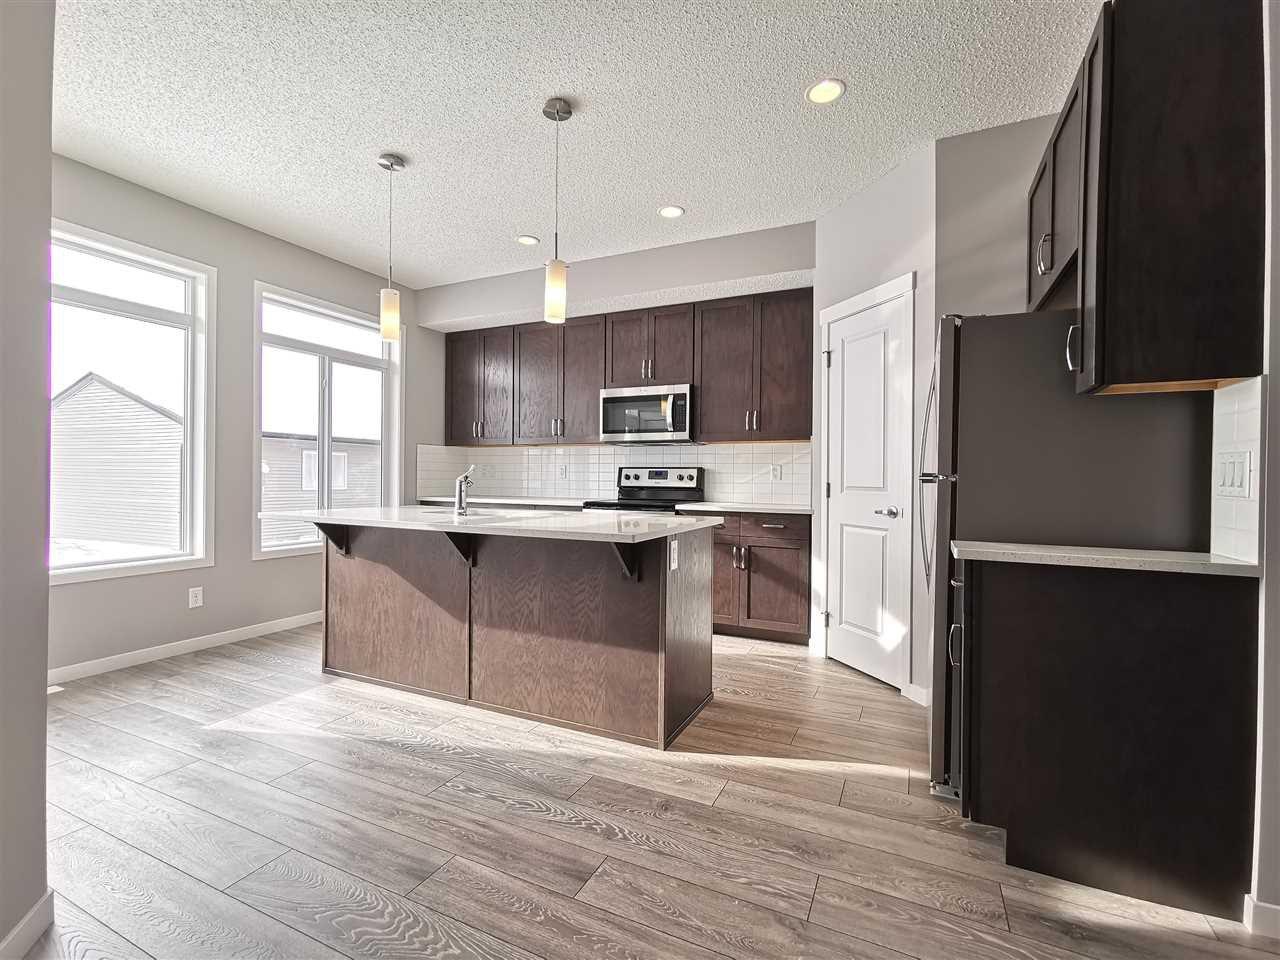 Main Photo: 6315 170 Avenue in Edmonton: Zone 03 House for sale : MLS®# E4143190